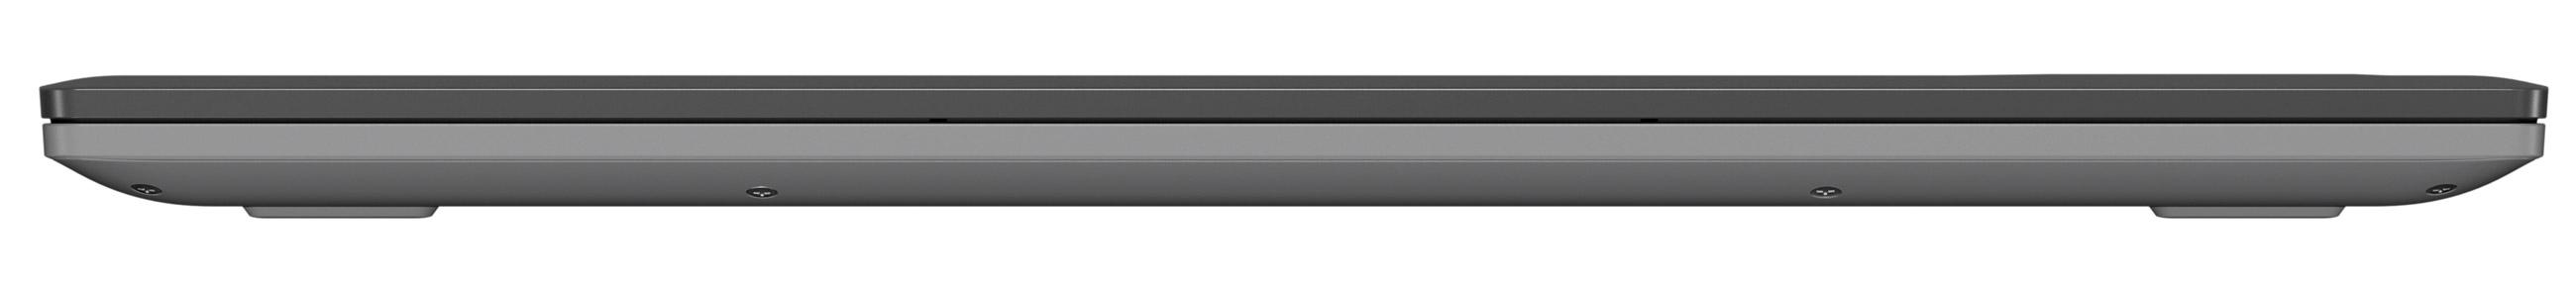 Фото  Ультрабук Lenovo Yoga 530 Onyx Black (81EK00KQRA)